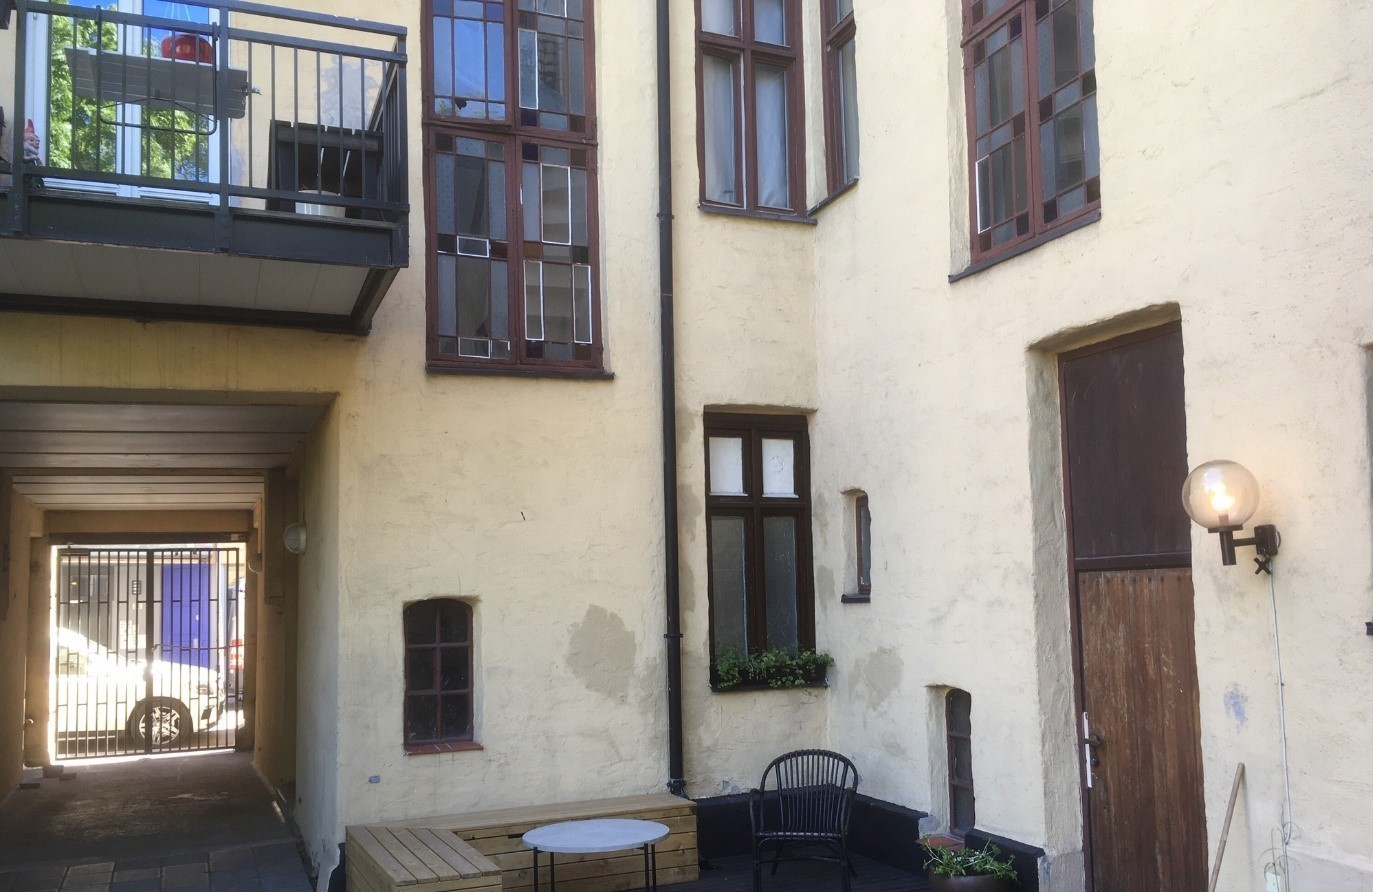 Bakgård Motzfeldtsgt 18 mai 2020-1.jpg